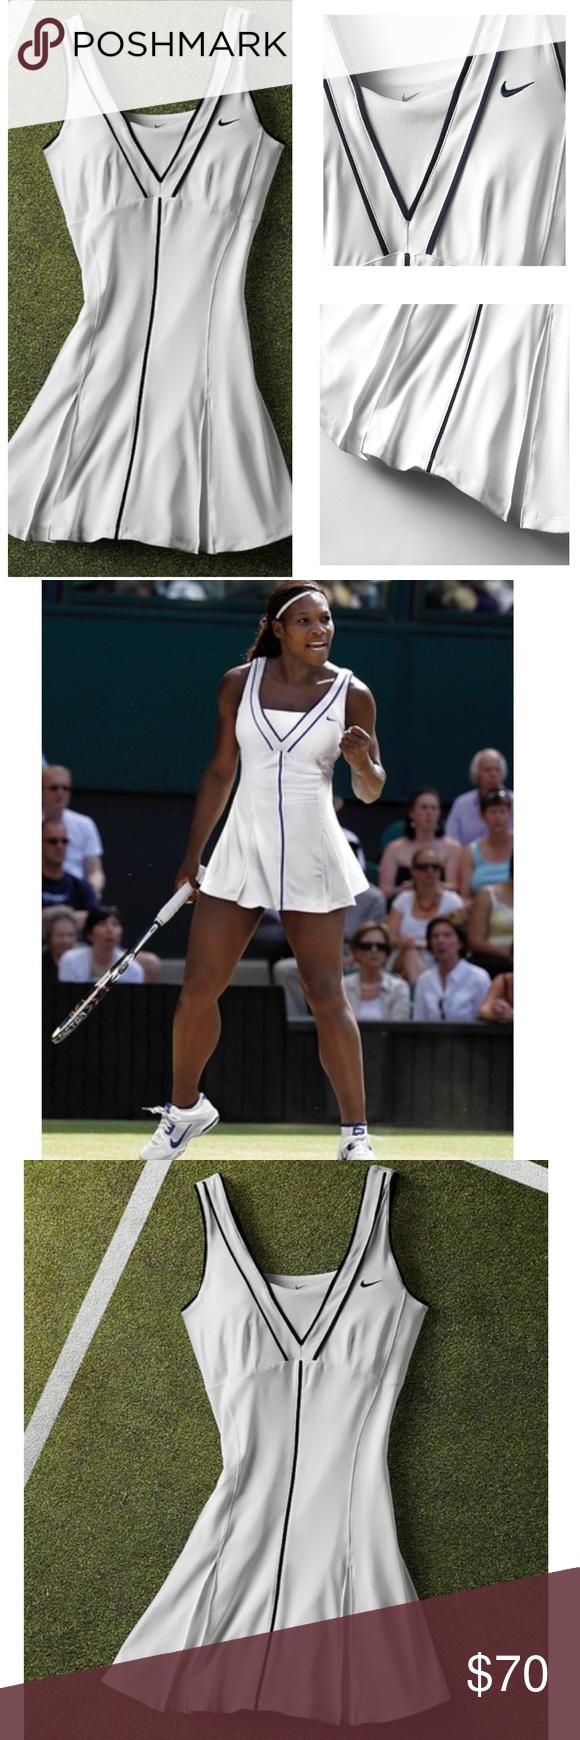 Nike Aso Serena Williams White Smash Tennis Dress Tennis Dress Nike Dresses